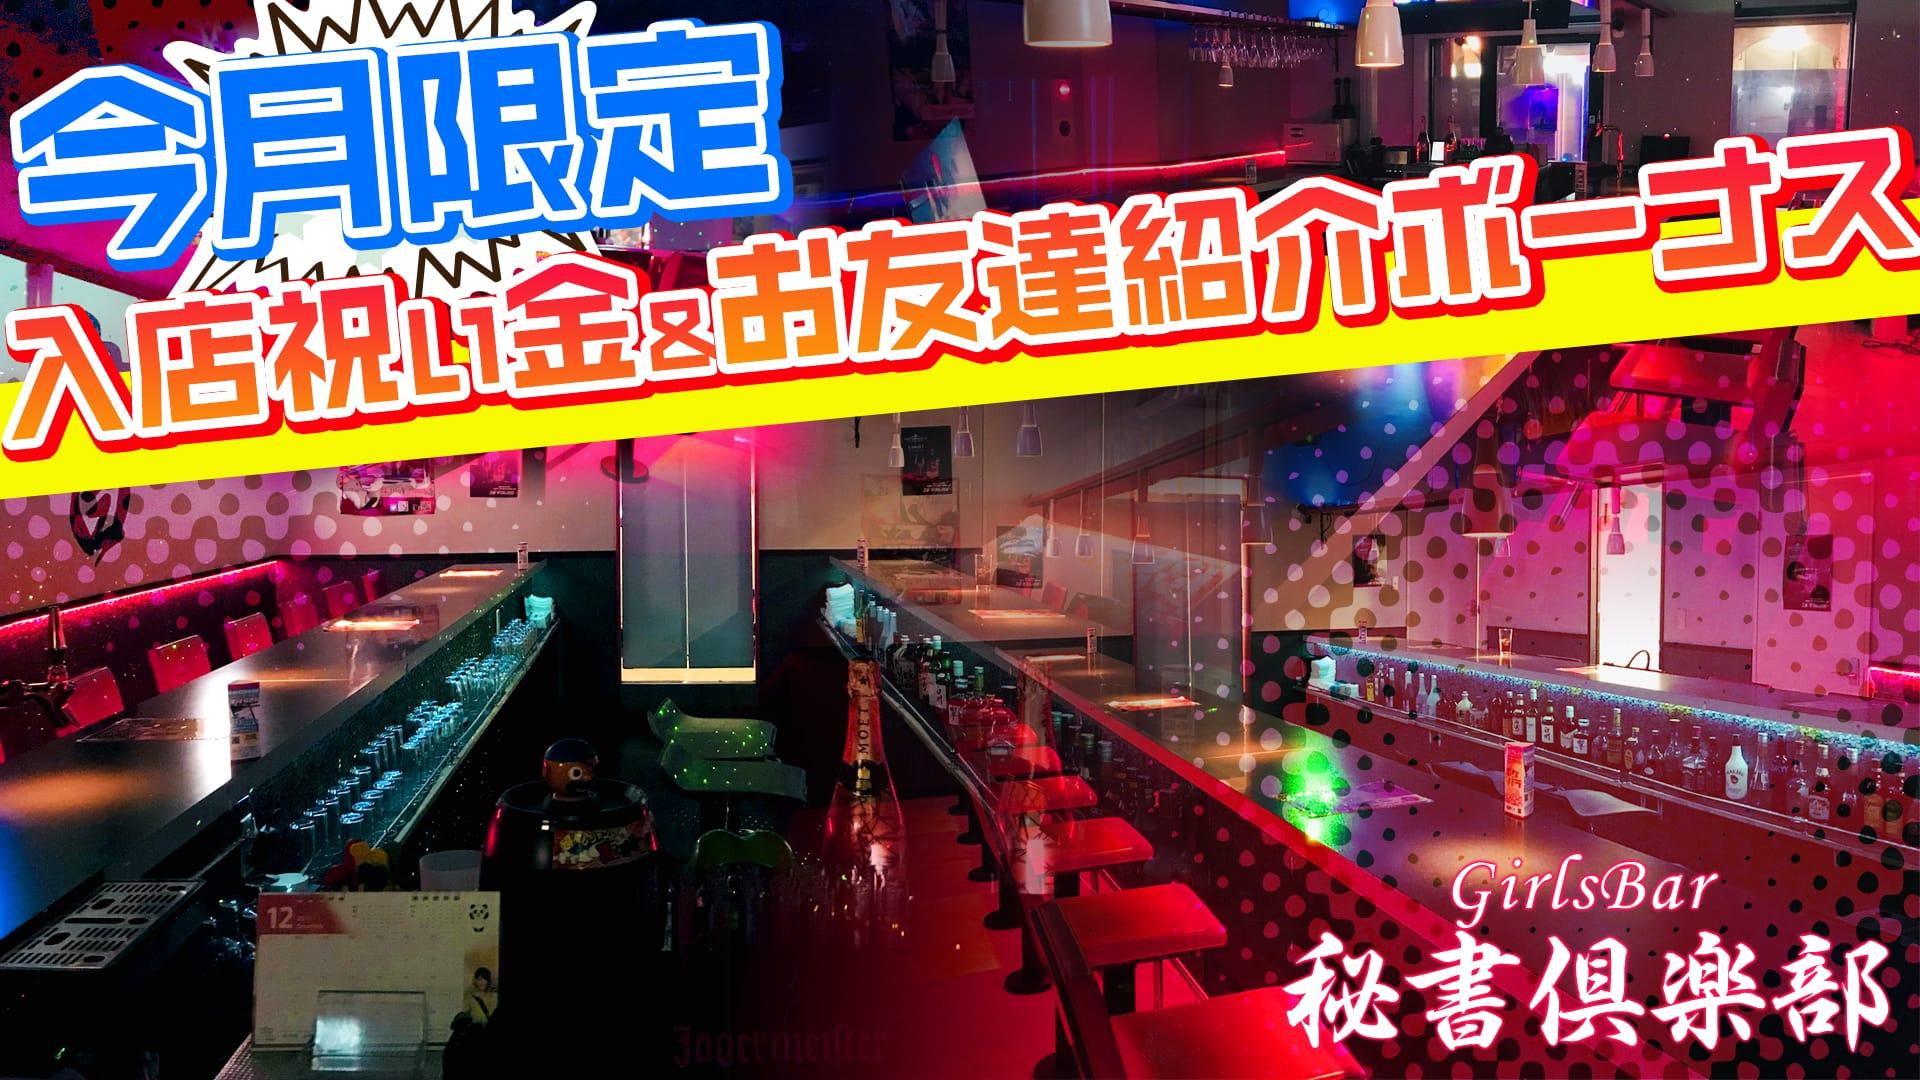 Girl's Bar 秘書倶楽部 五反田ガールズバー TOP画像